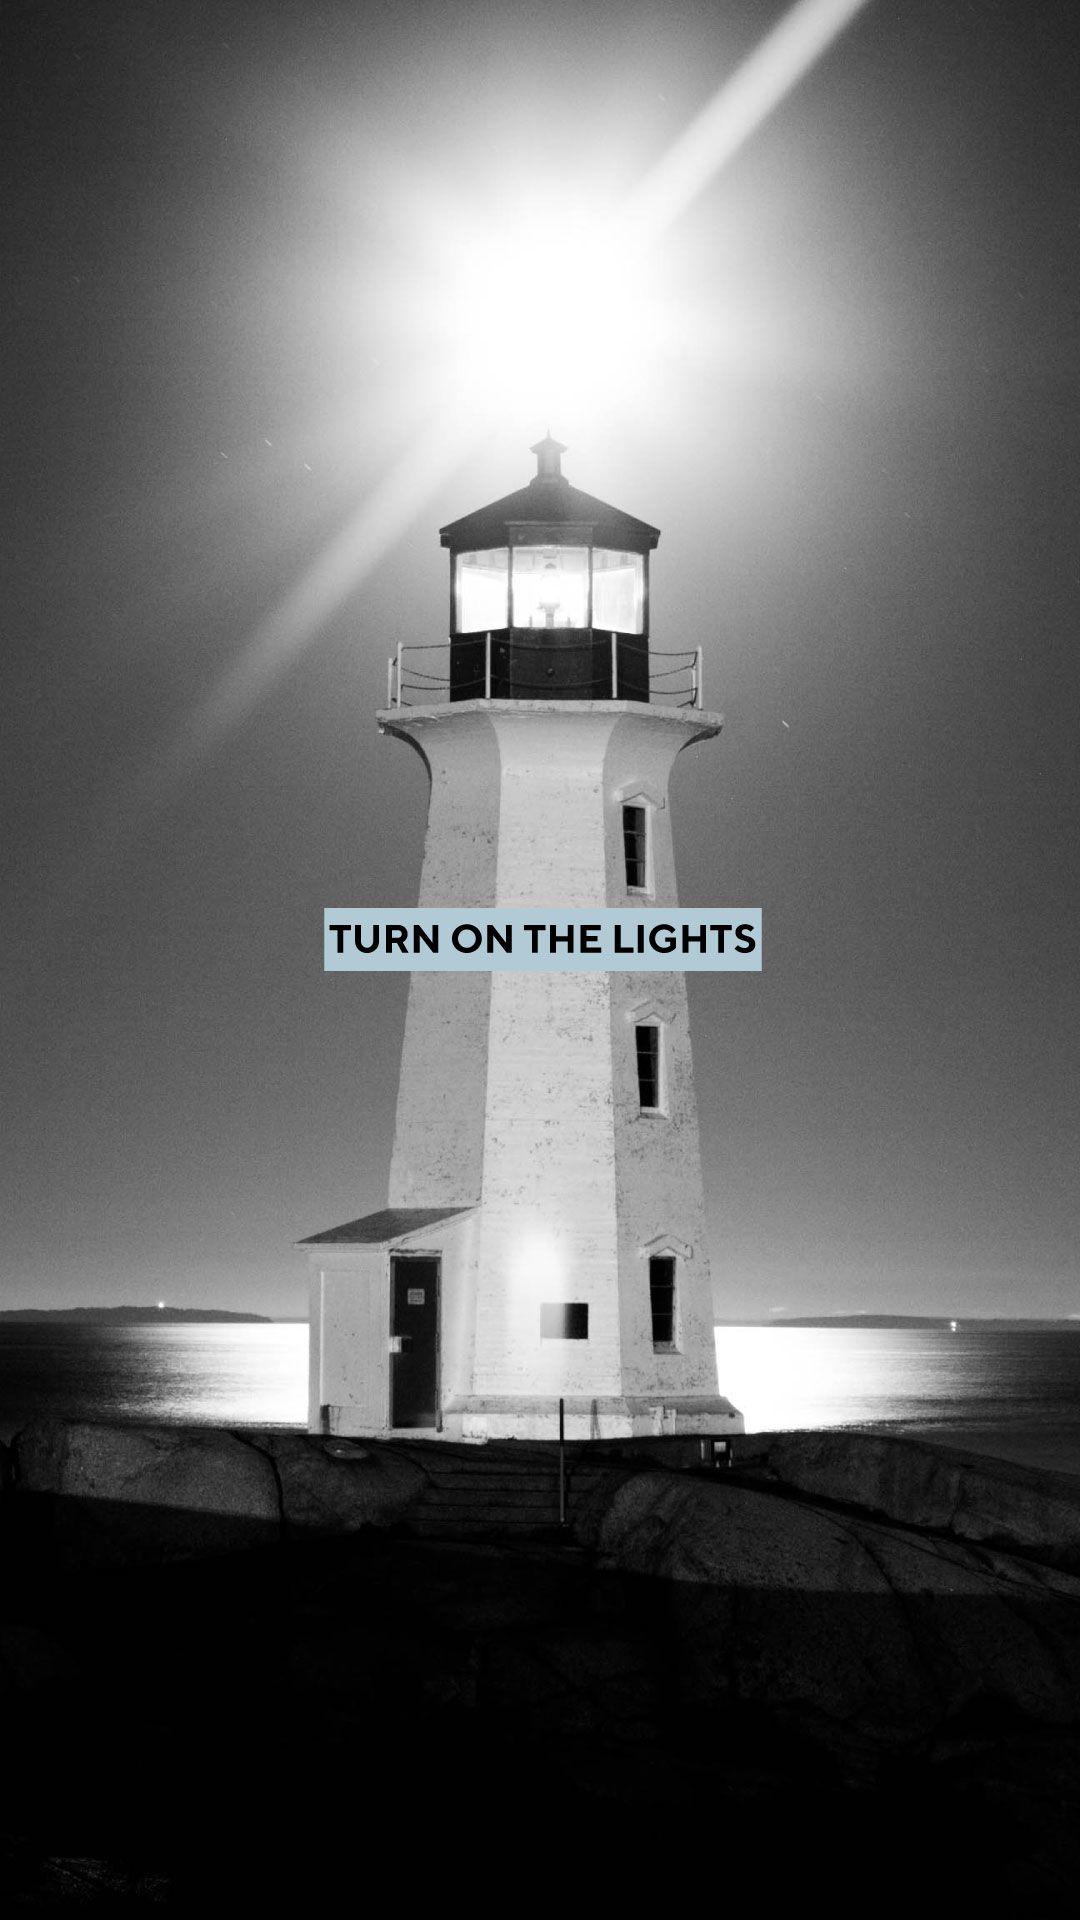 light-city-turn-on-the-lights